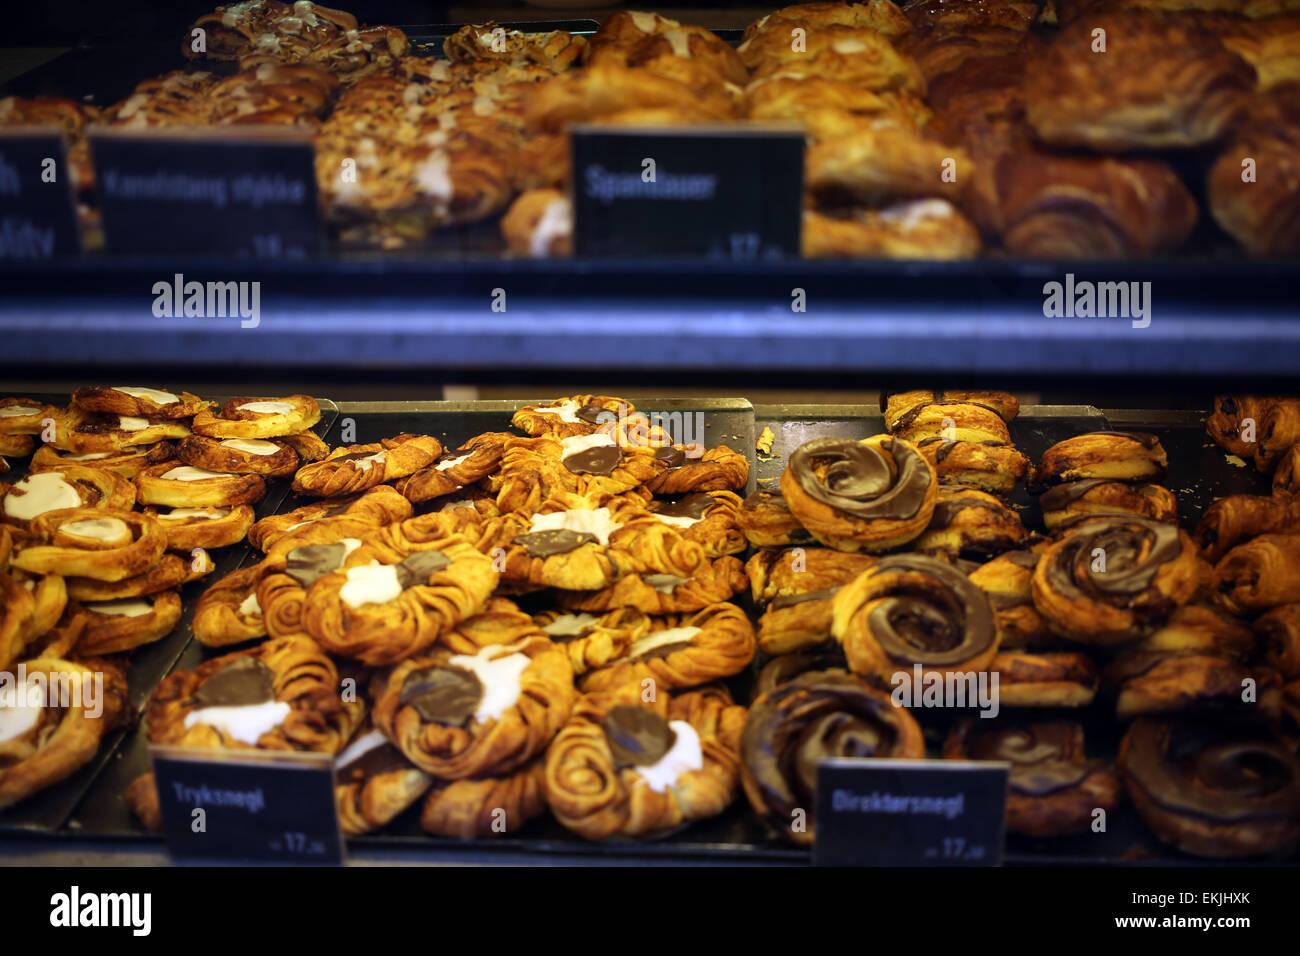 Copenhagen Bakery Cakes